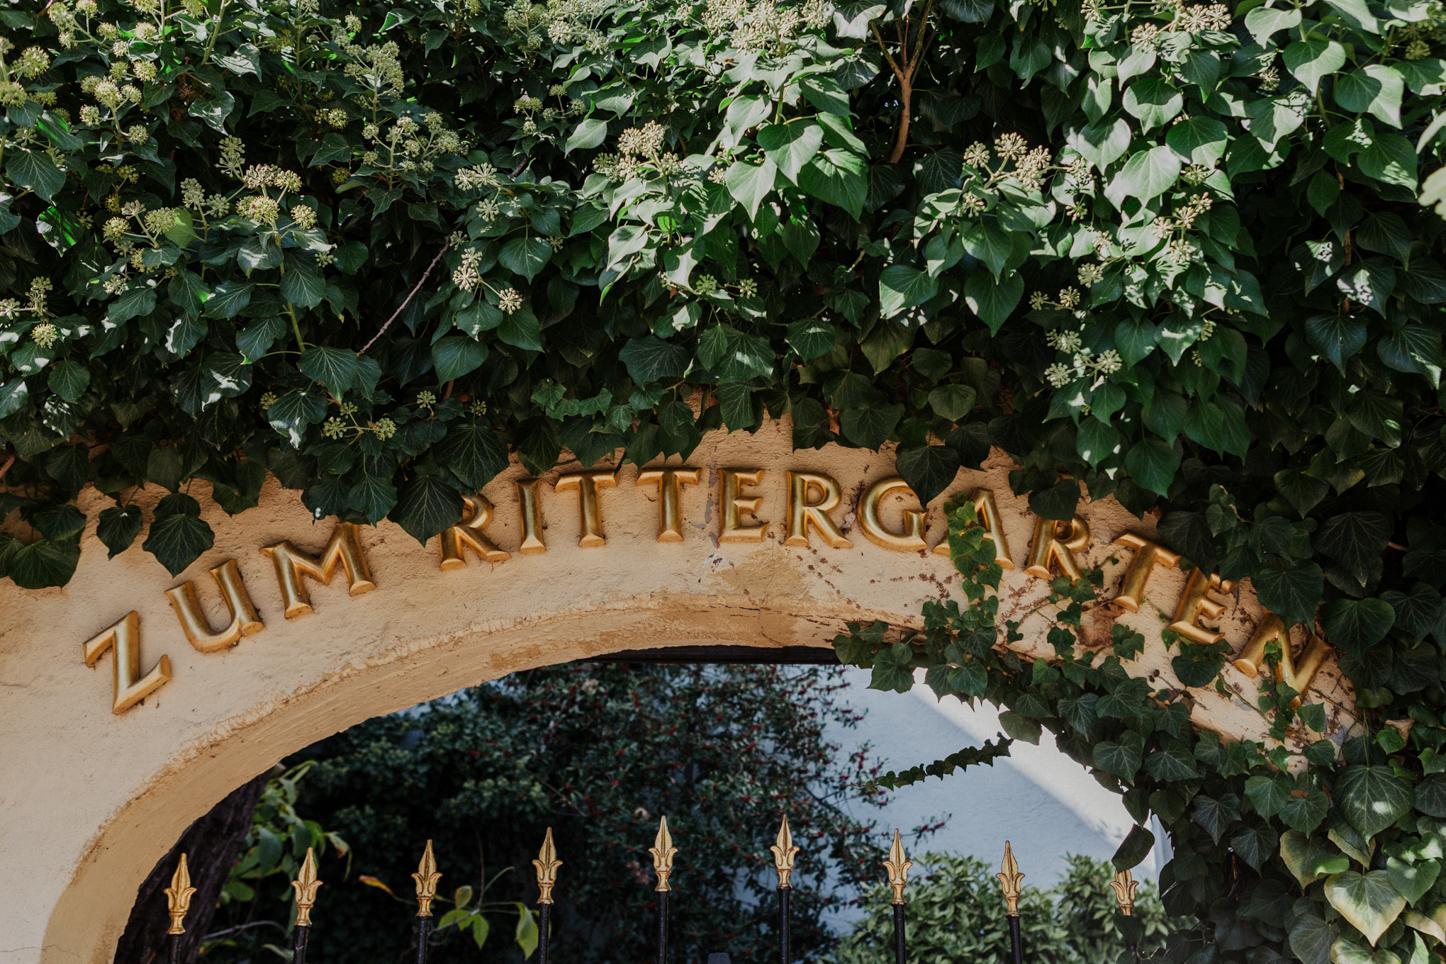 Eingangstor zum Weingut Fitz Ritter